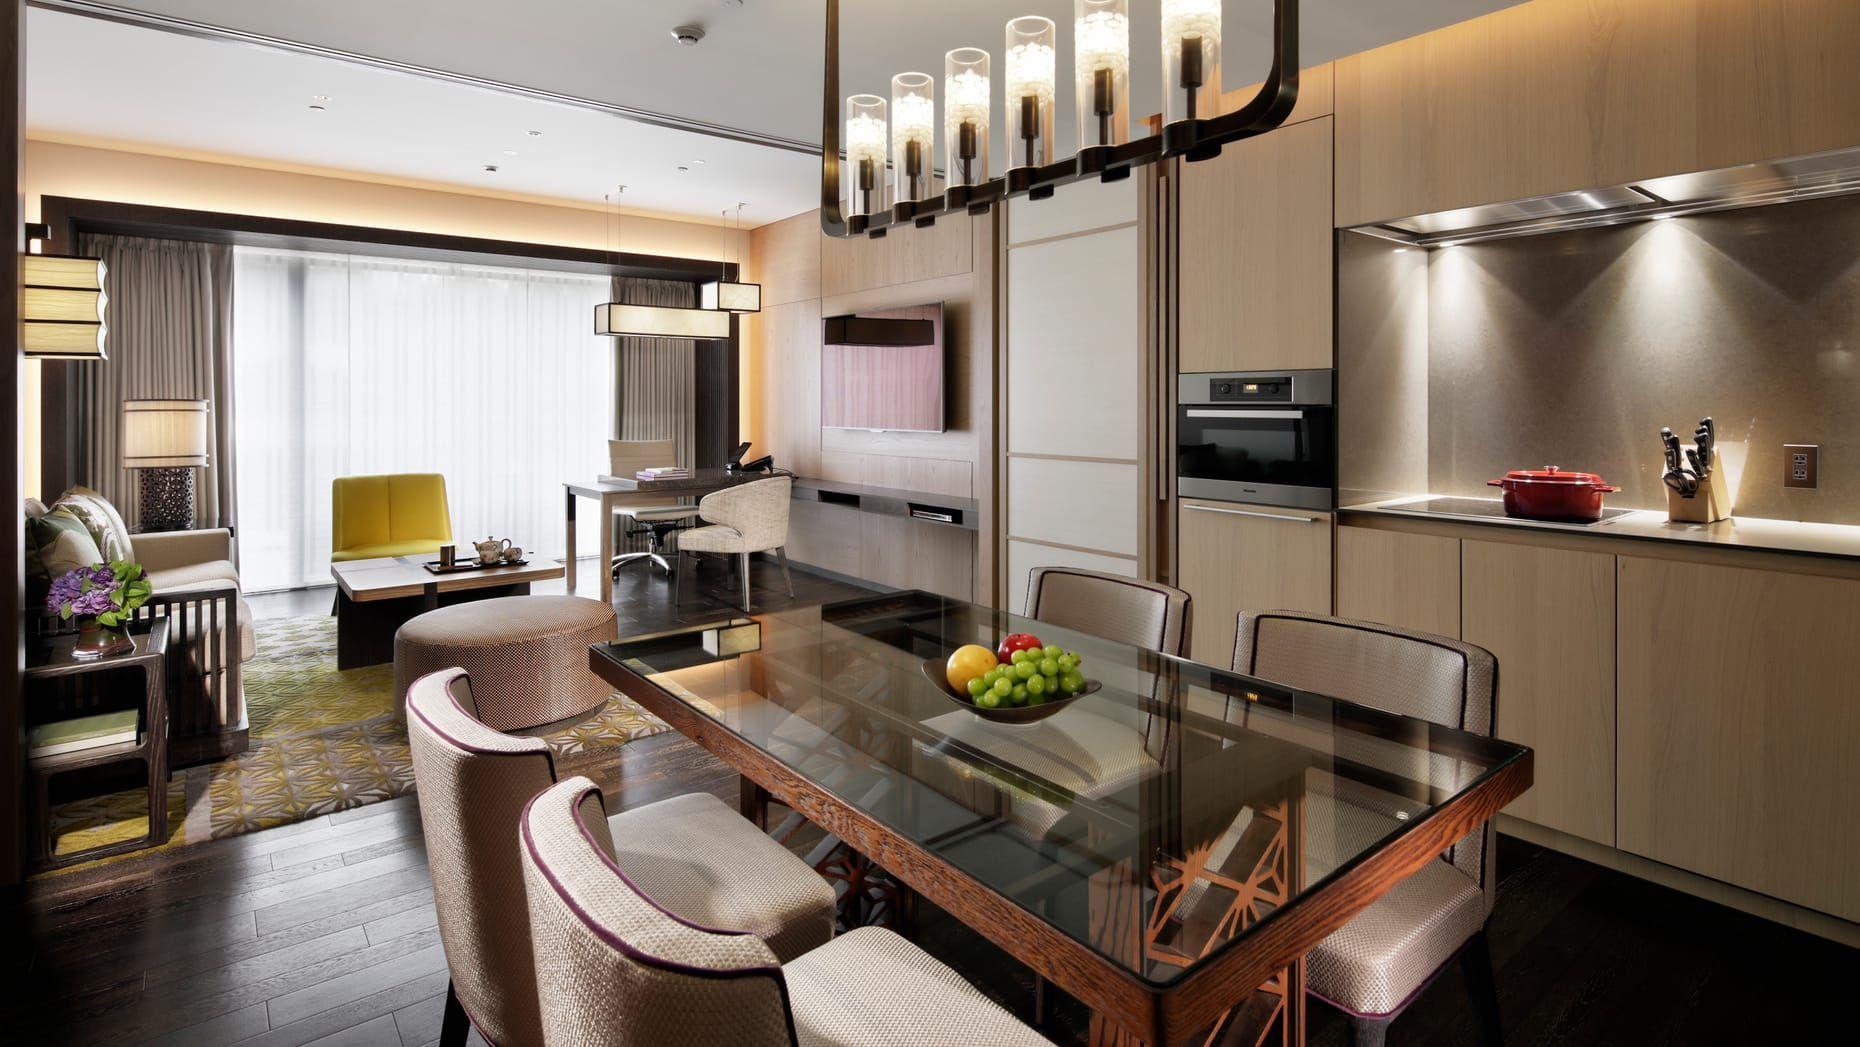 5 Star Luxury Hotel Rooms Suites Four Seasons Kyoto Luxury